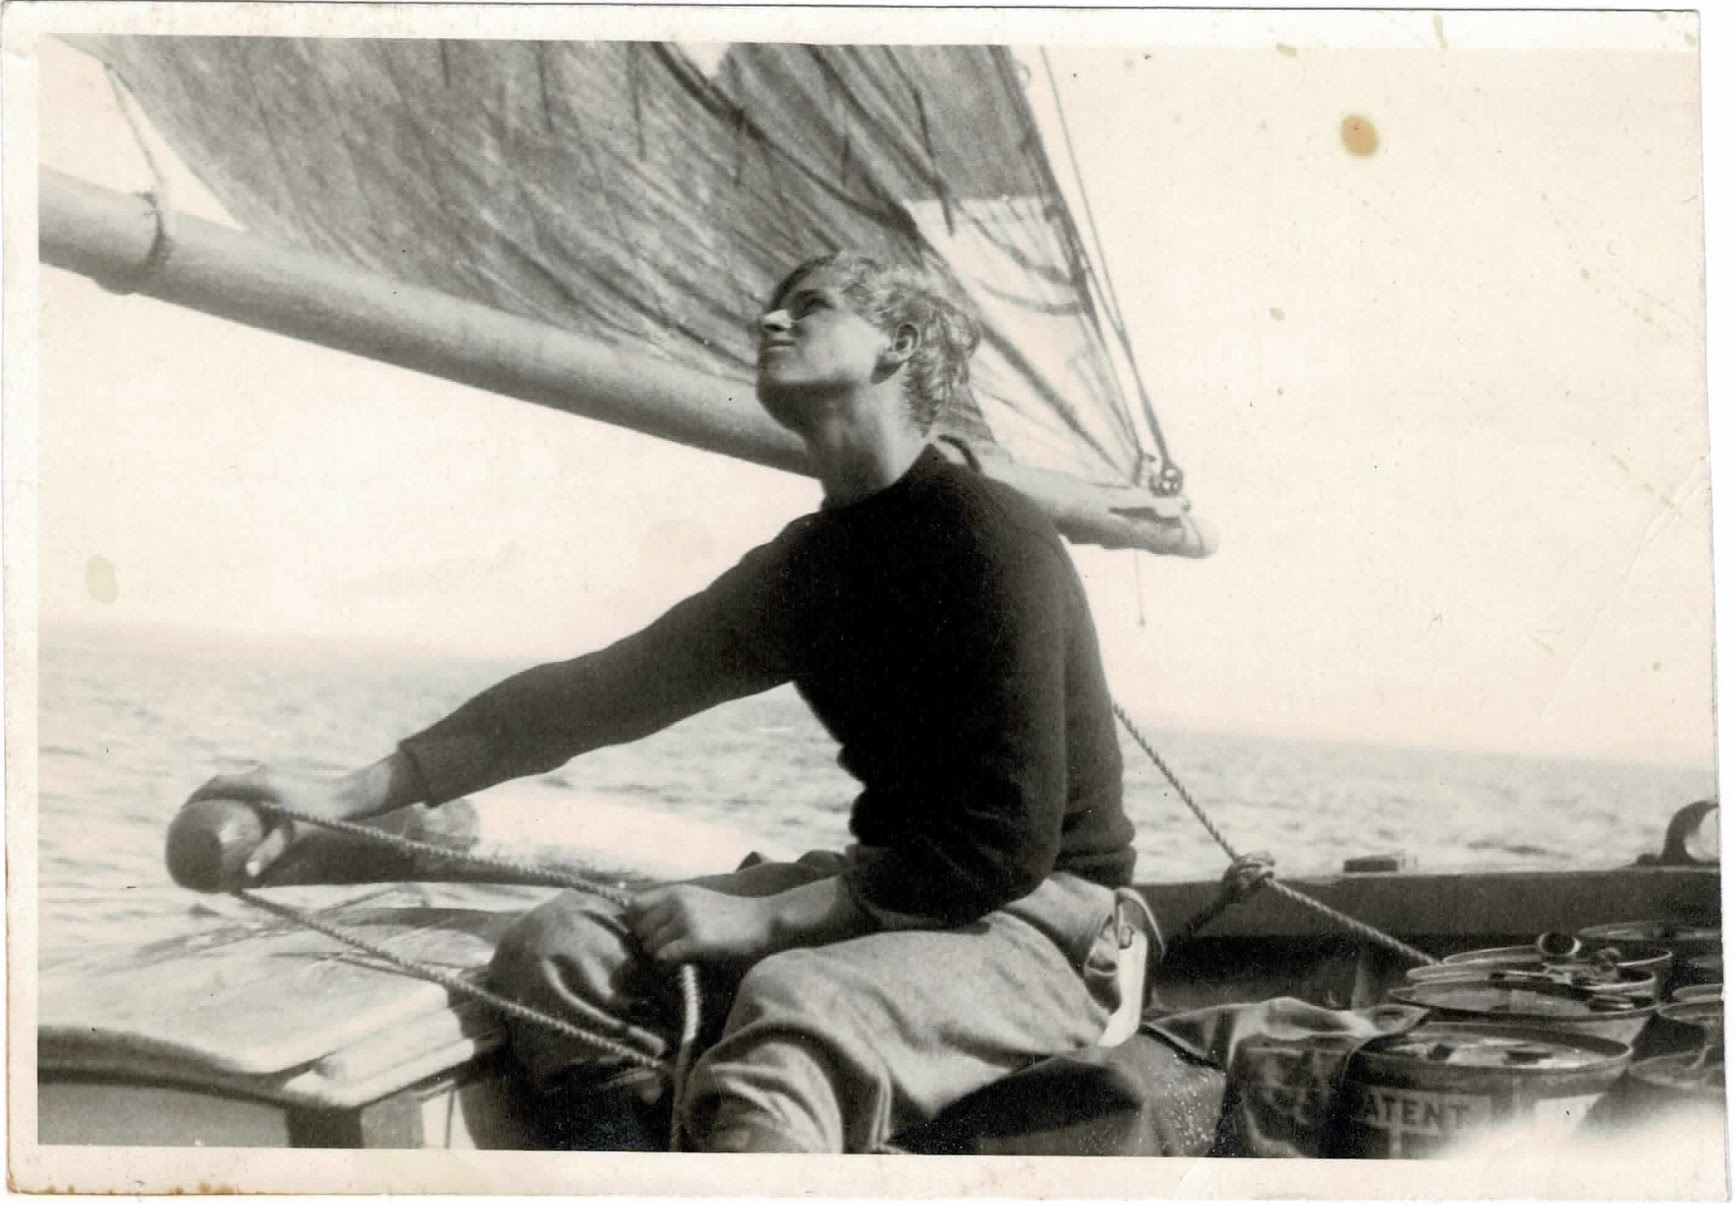 Funeral Felipe de Edimburgo navegando